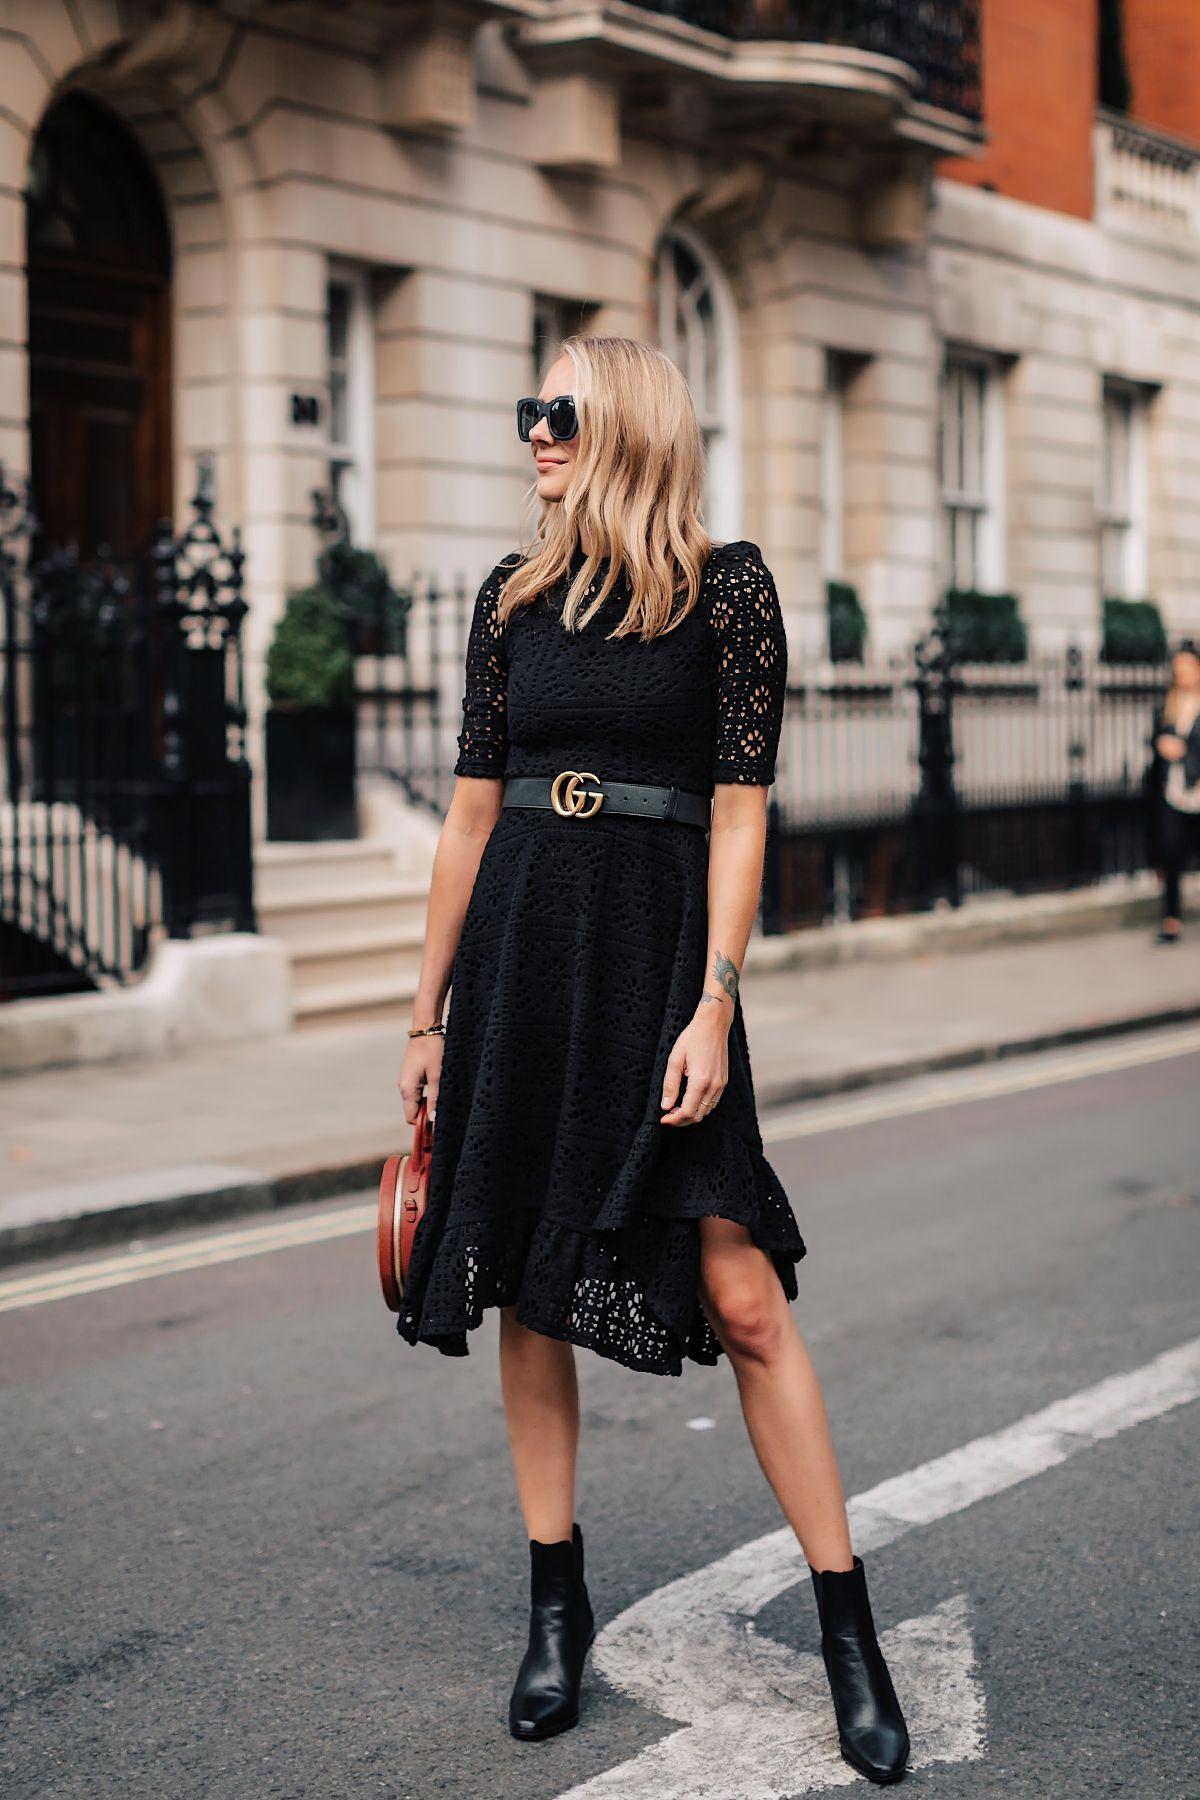 Woman Wearing Reformation Black Dress Tan Ankle Strap Heeled Sandals Chanel Tan Diana Handbag Gold Coin Necklace Fash Fashion Fashion Jackson Tight Black Dress [ 1104 x 736 Pixel ]